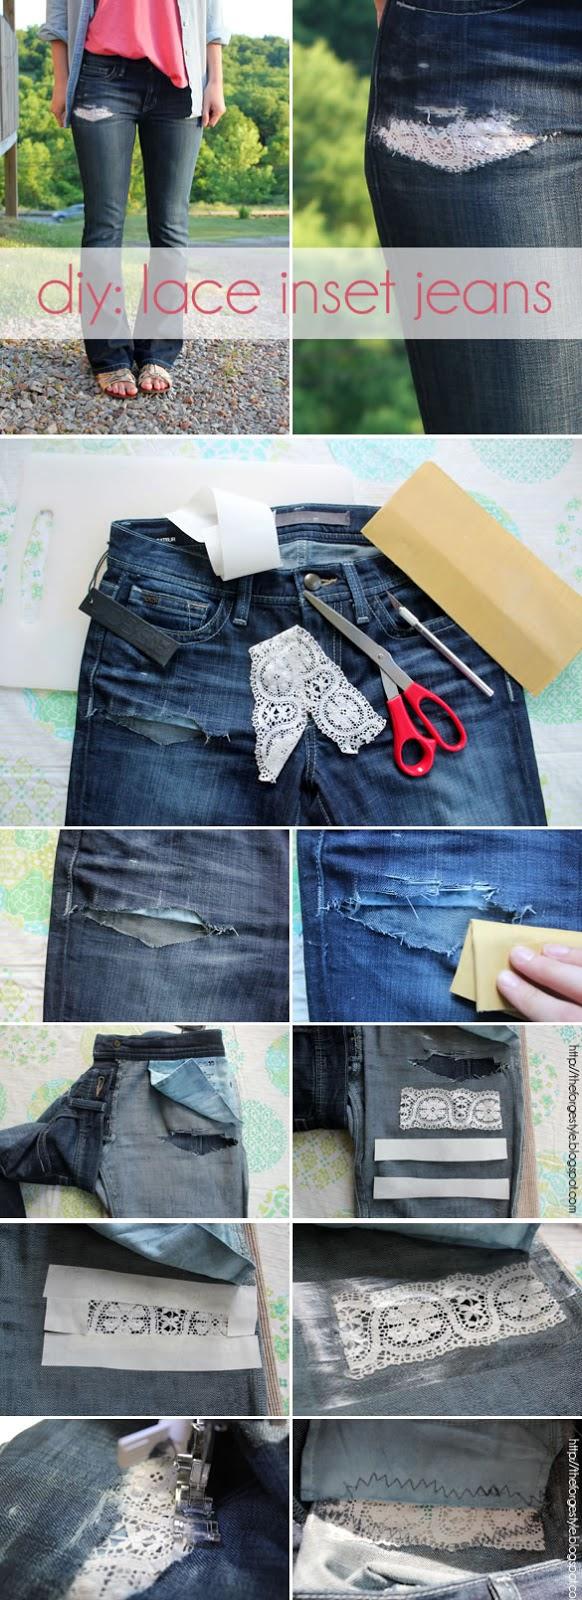 Diy  Lace inset into jeans | diy craft TUTORIALS